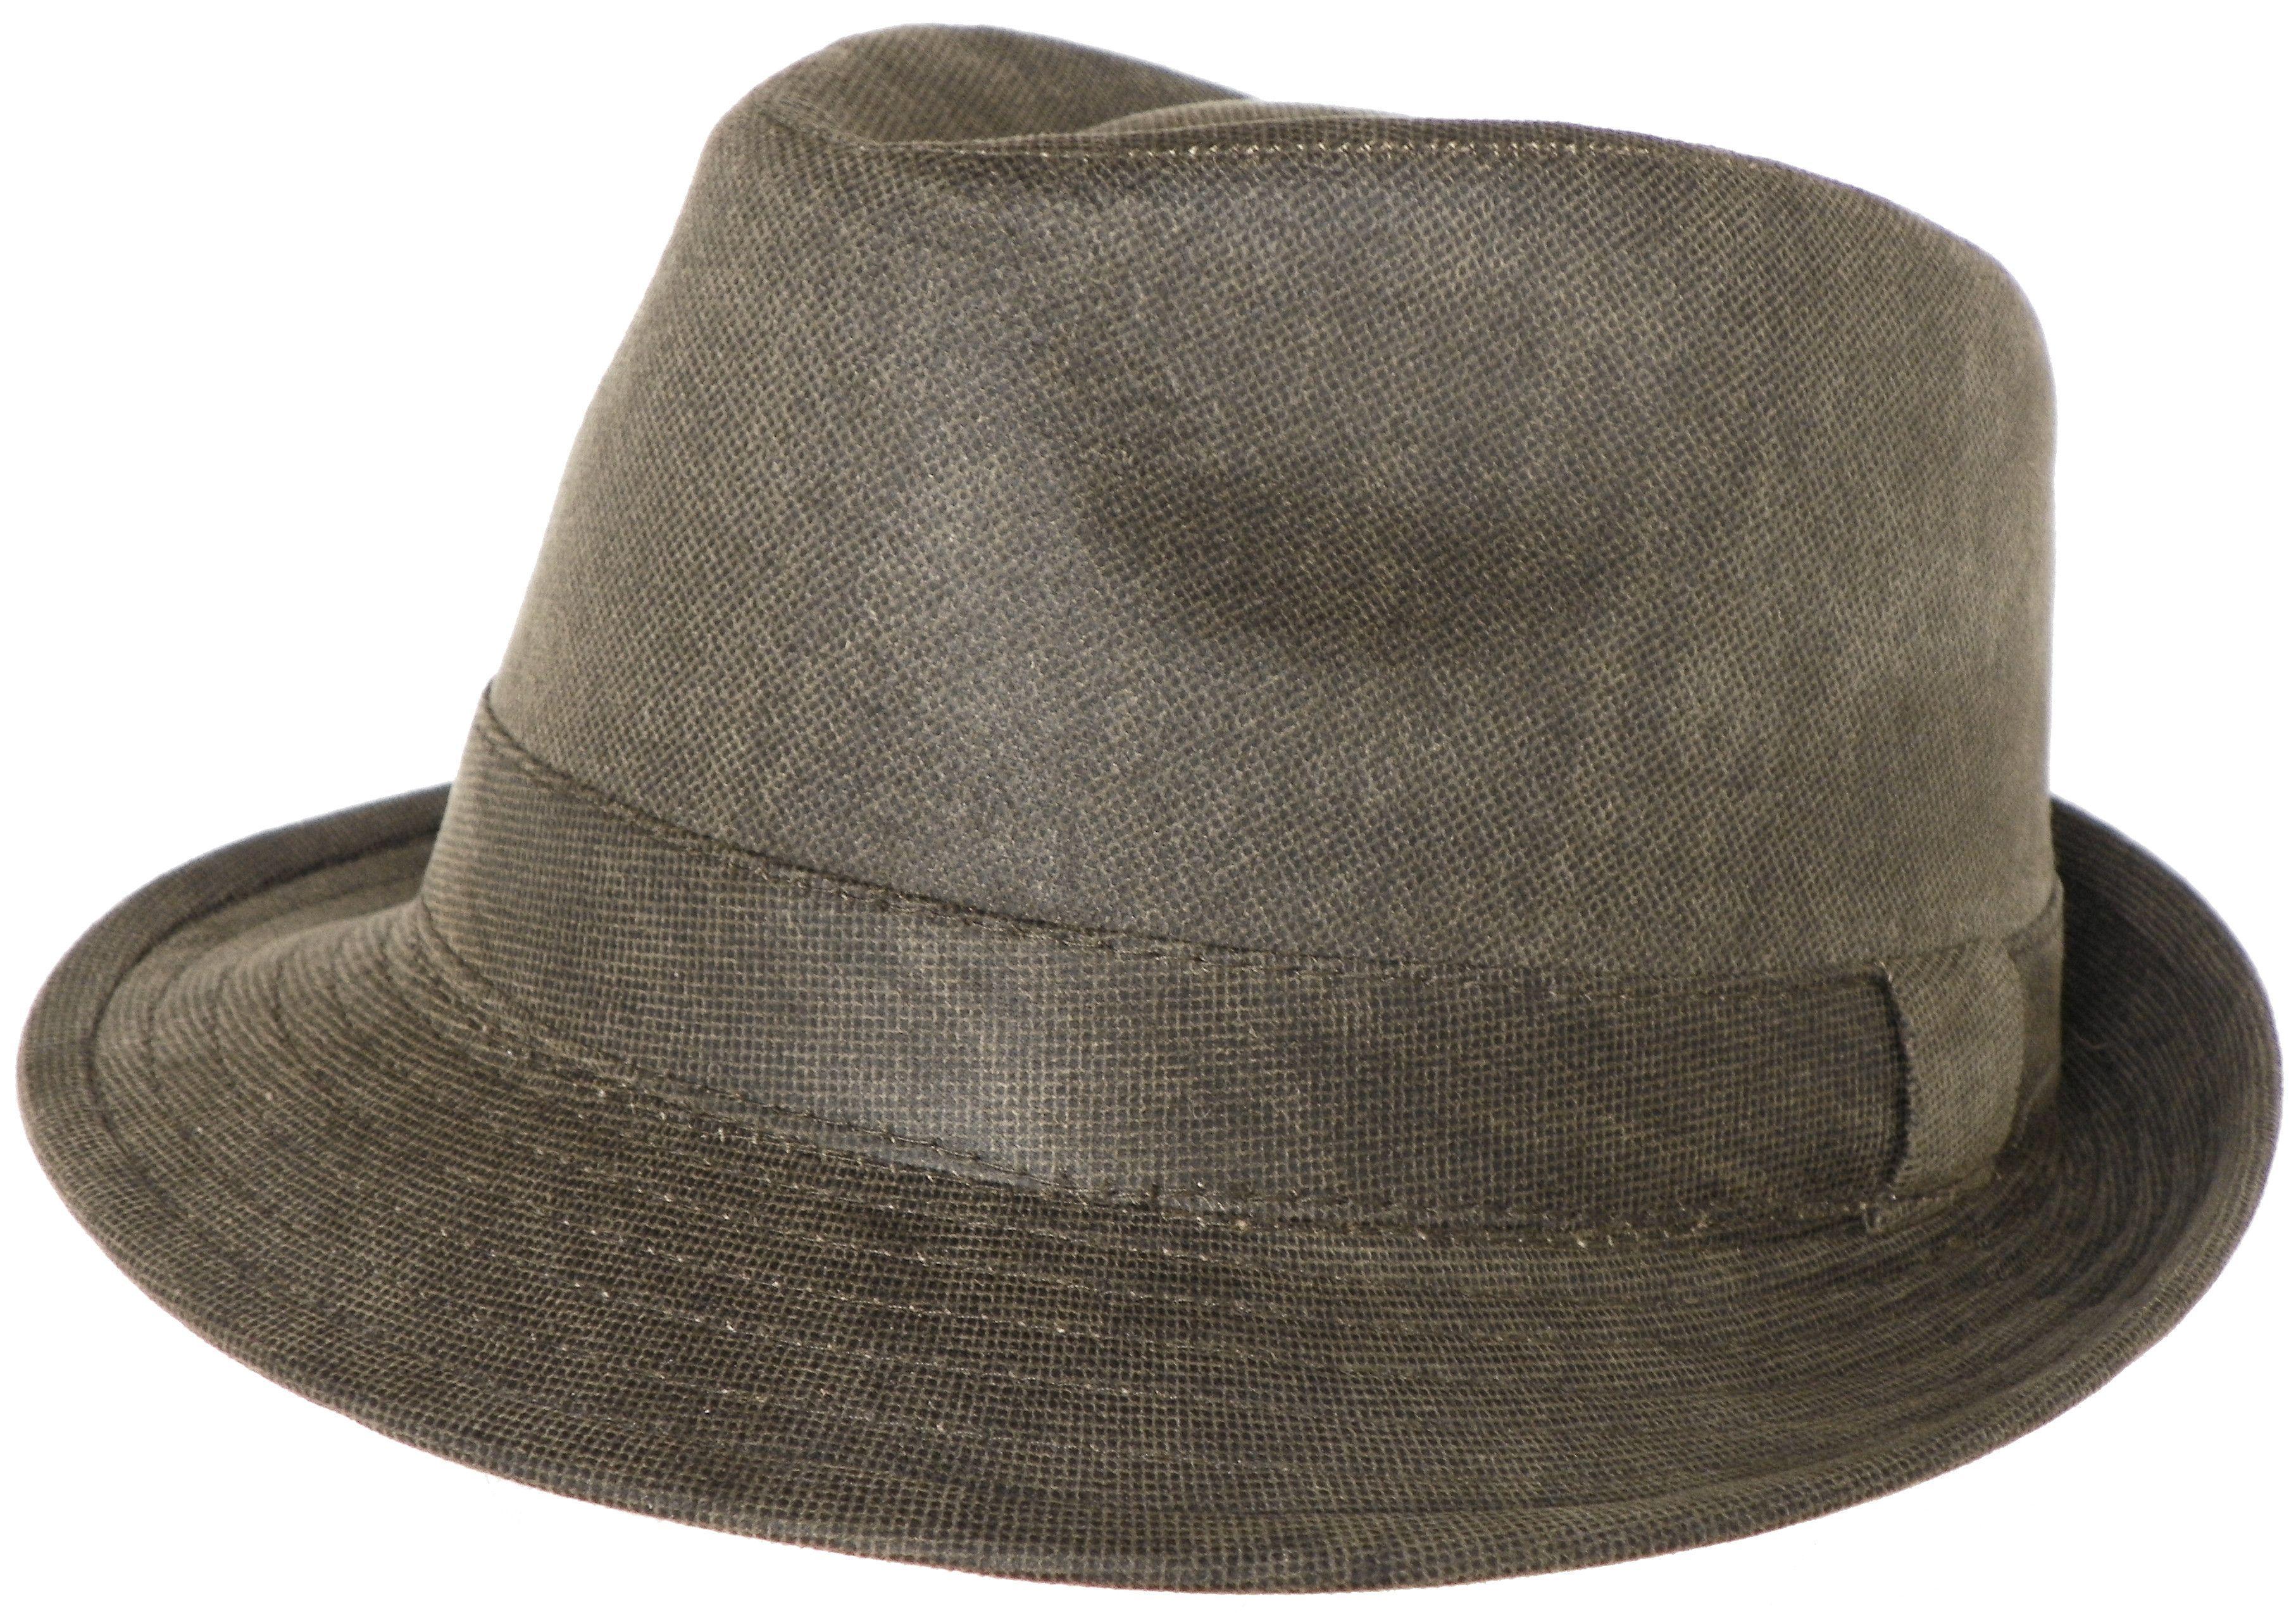 Henschel Stingy Brim Trilby Distressed Cotton Fedora Olive Green Hat ... f5cfc76ef7fe